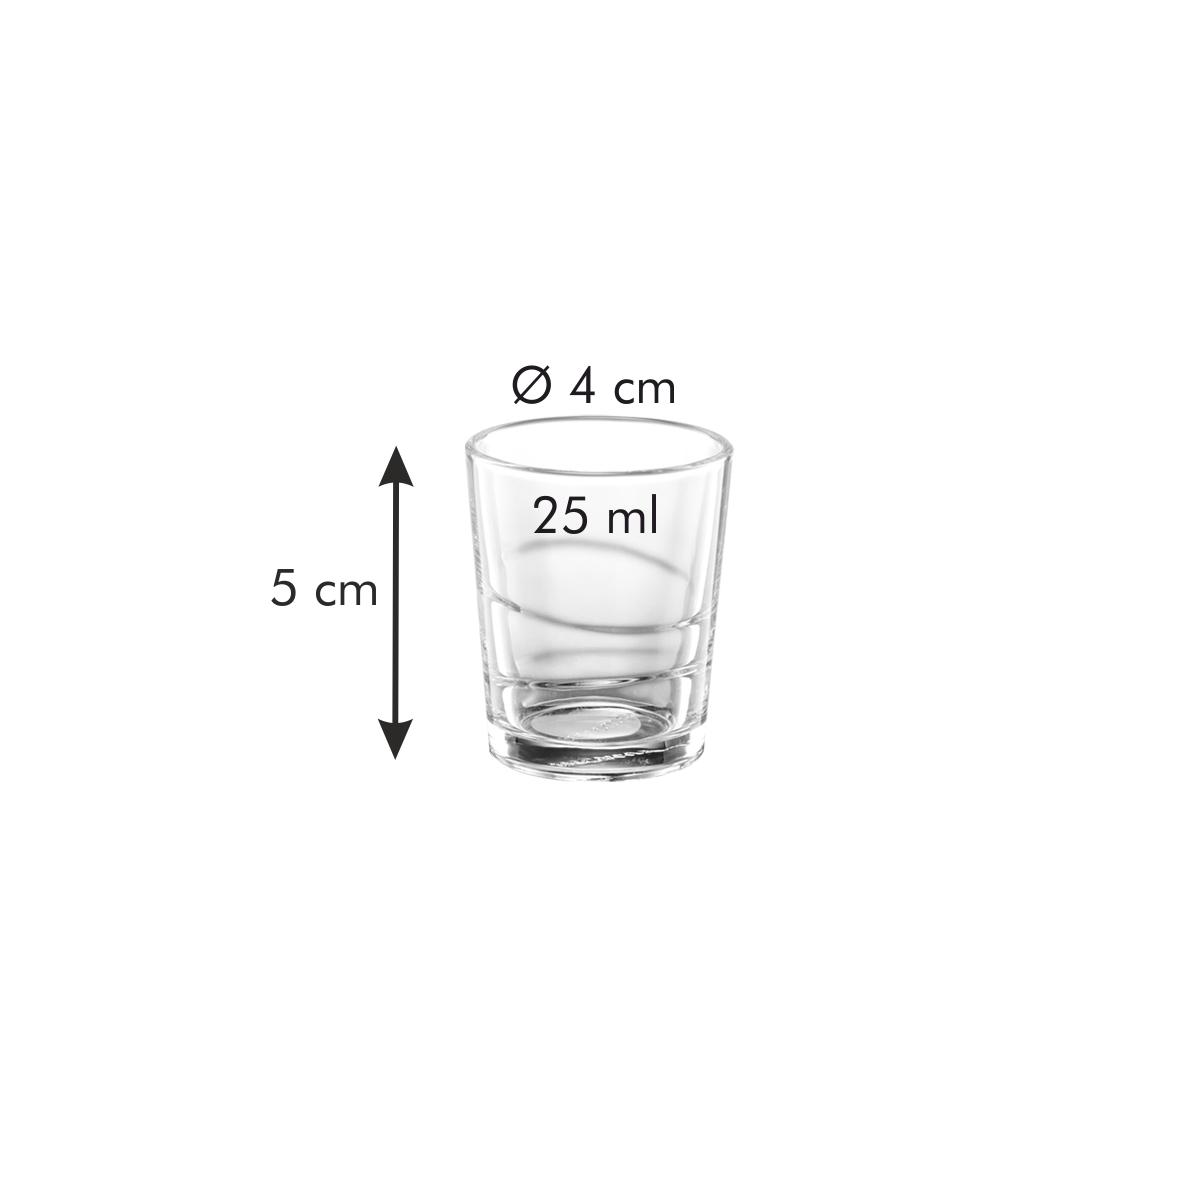 Panák myDRINK 25 ml, 6 ks